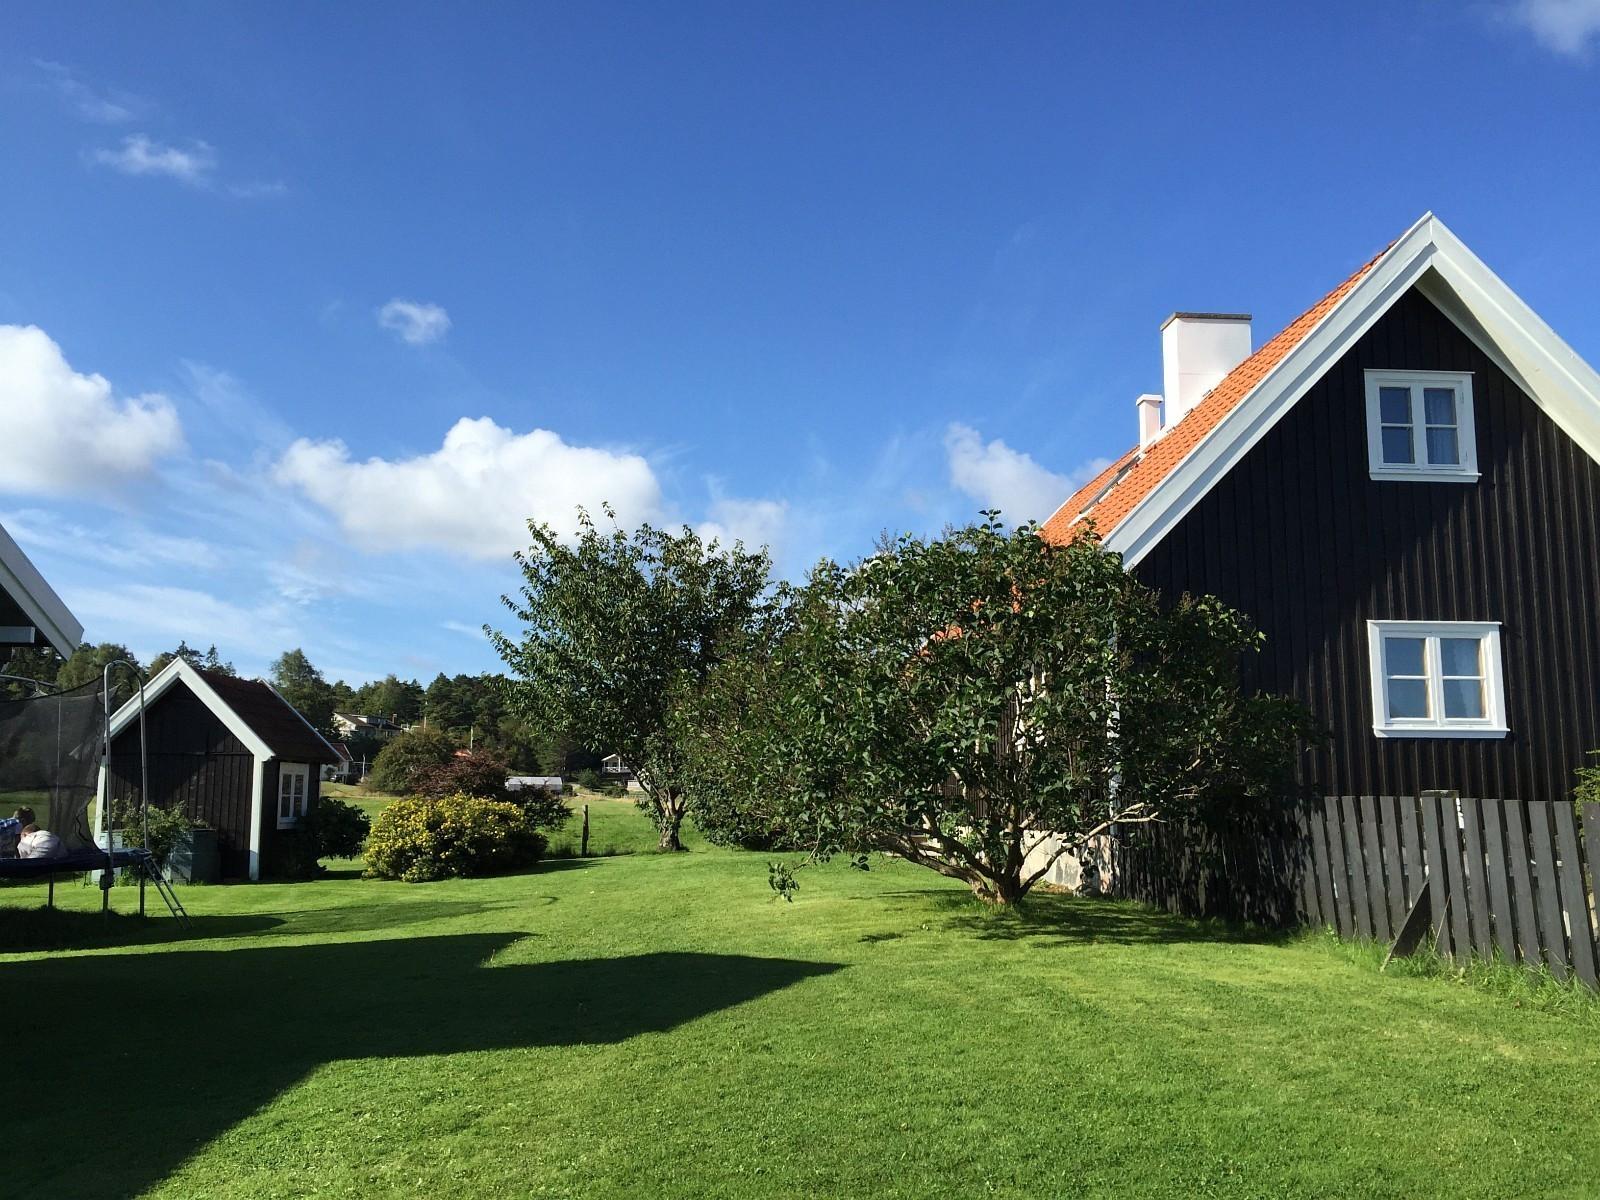 Flott hus med stor hage og trampoline.